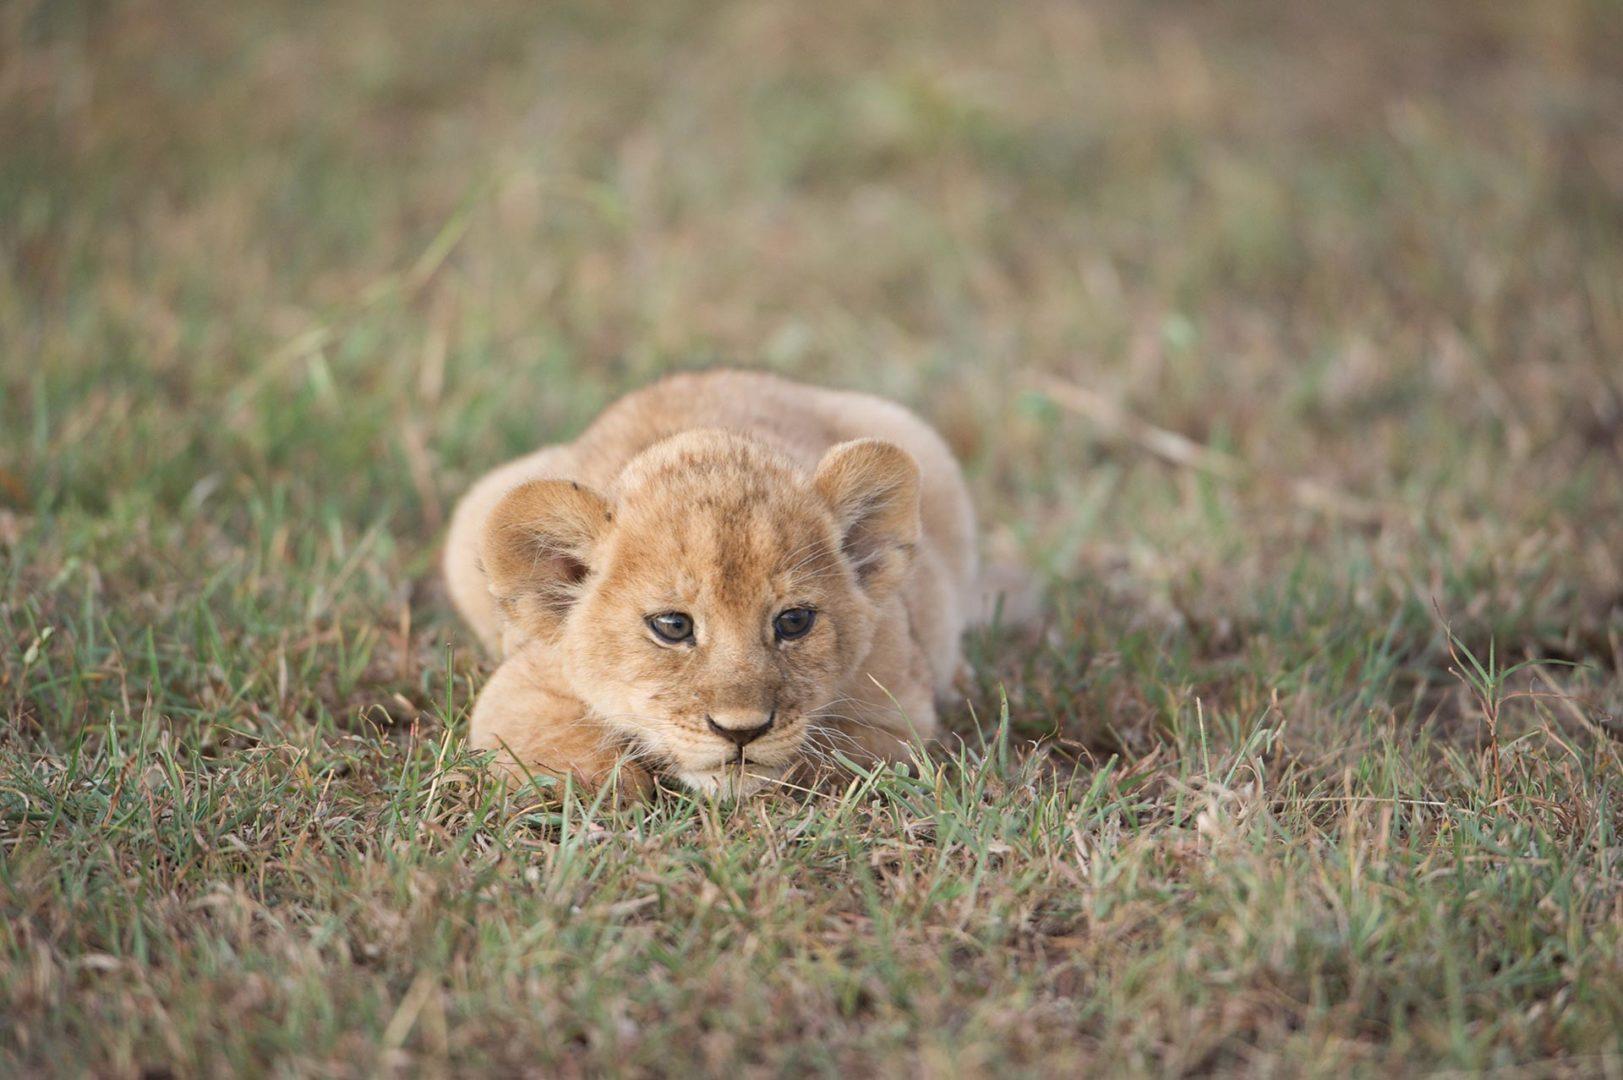 Safari is on my bucket-list